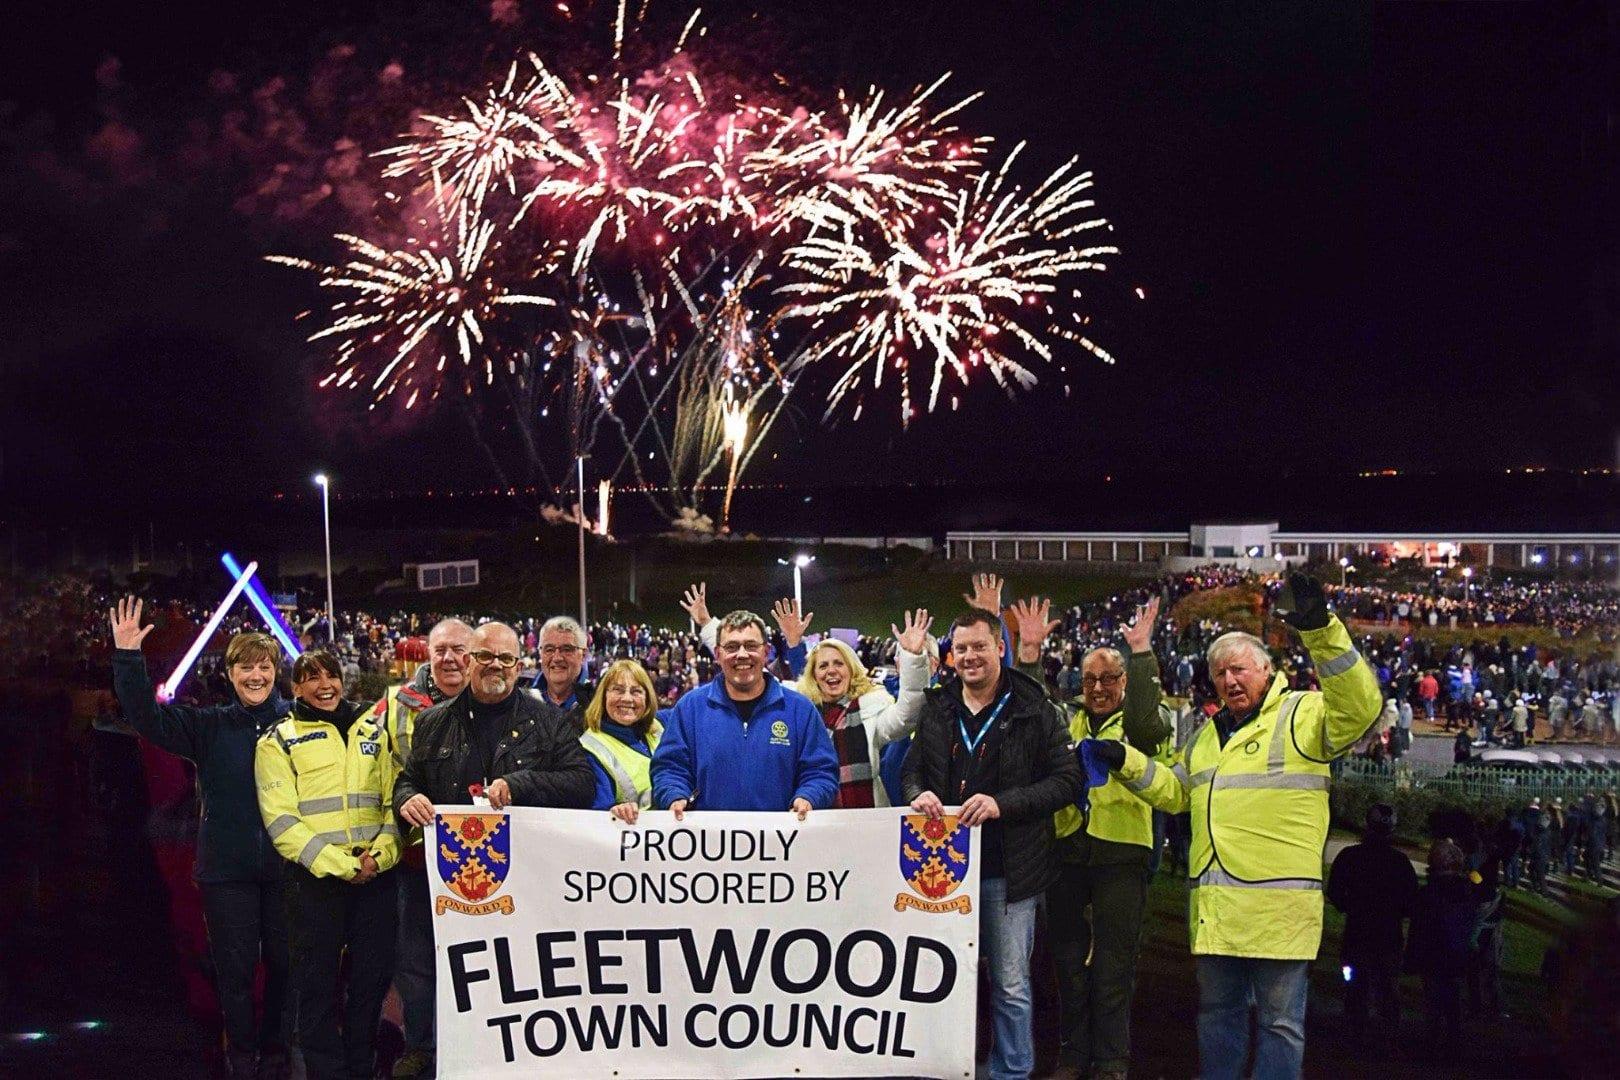 Fleetwood Fireworks